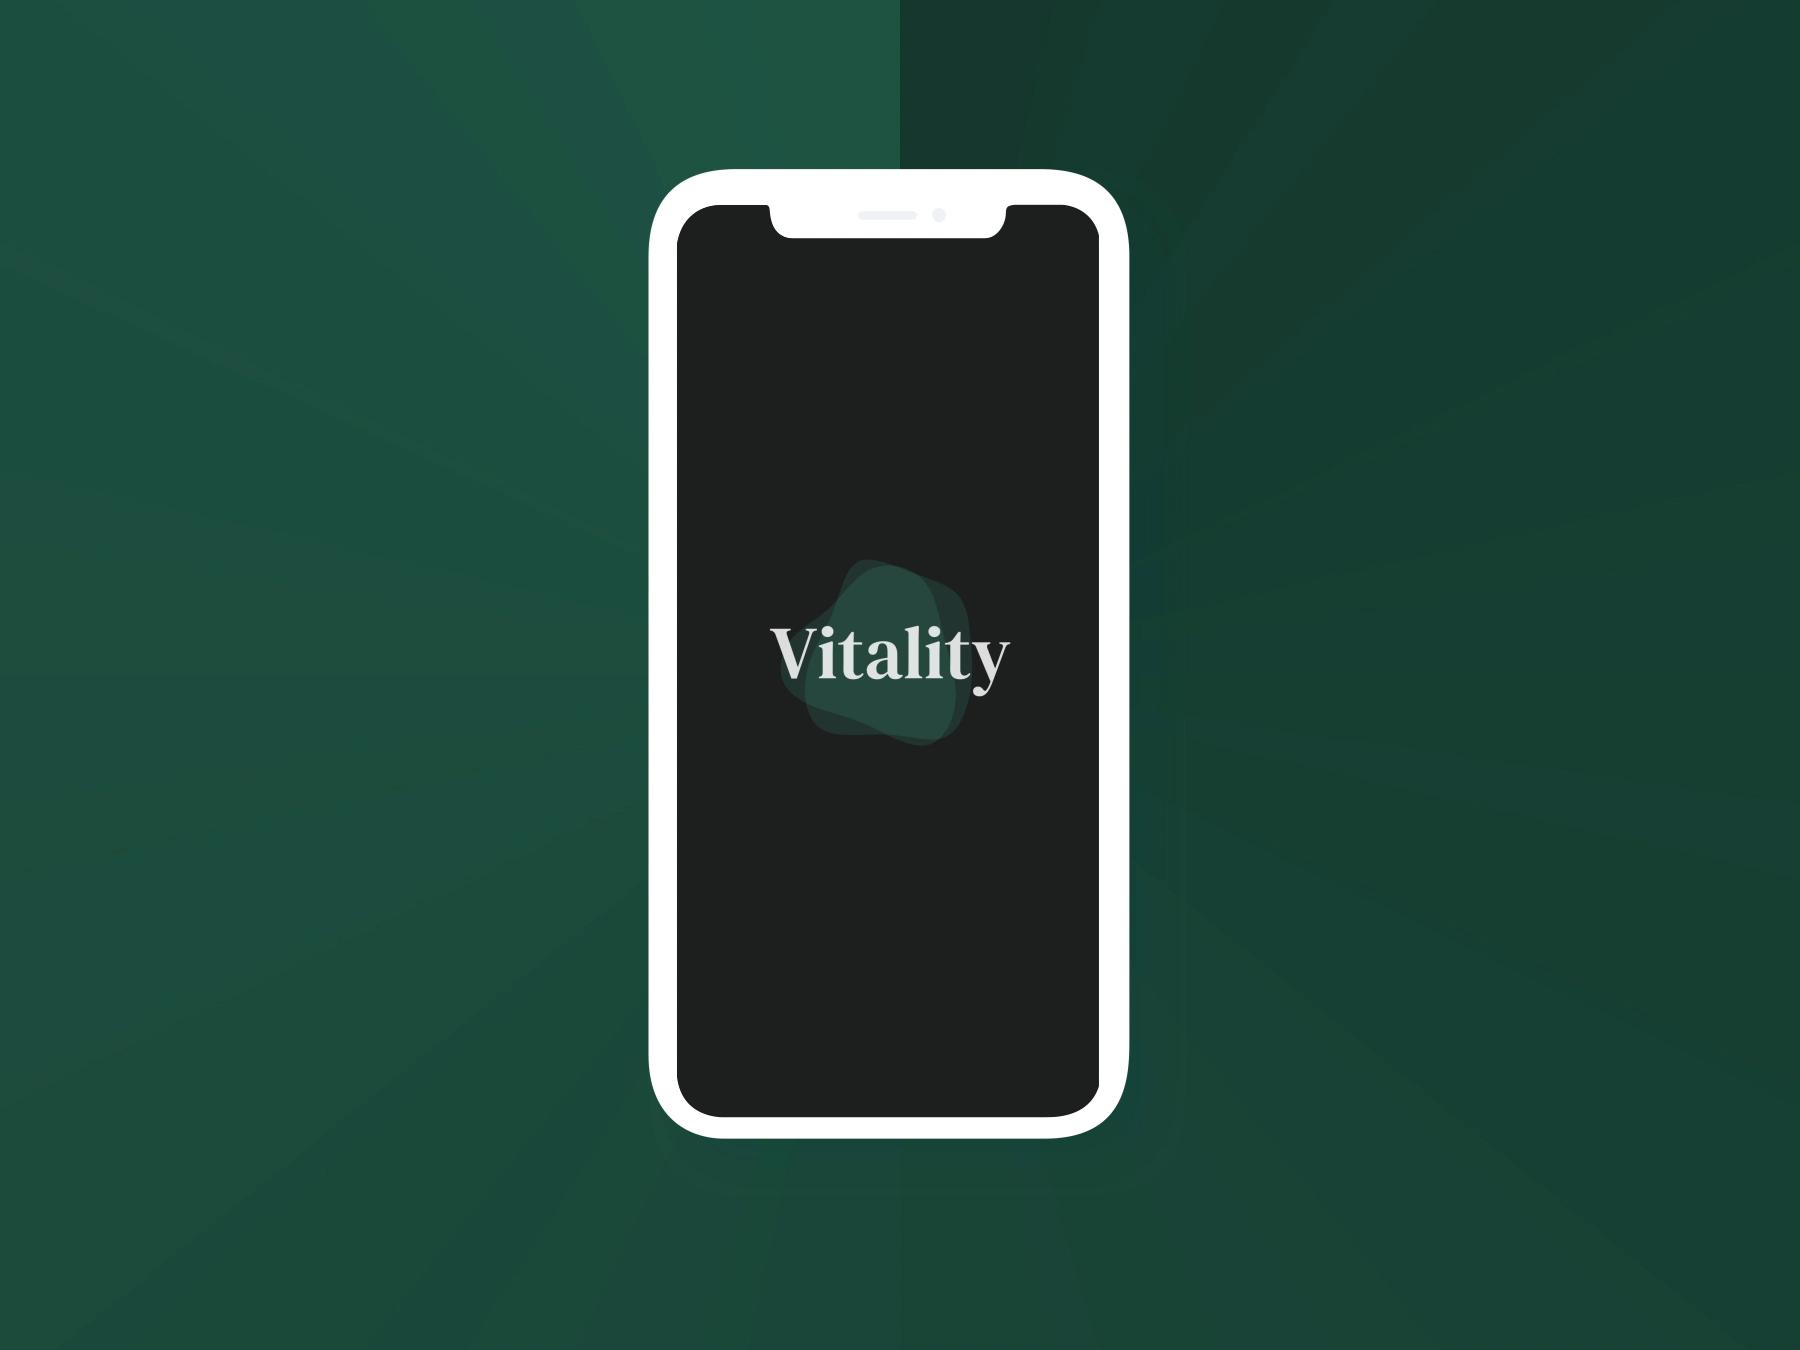 Vitality iphone mockup v3